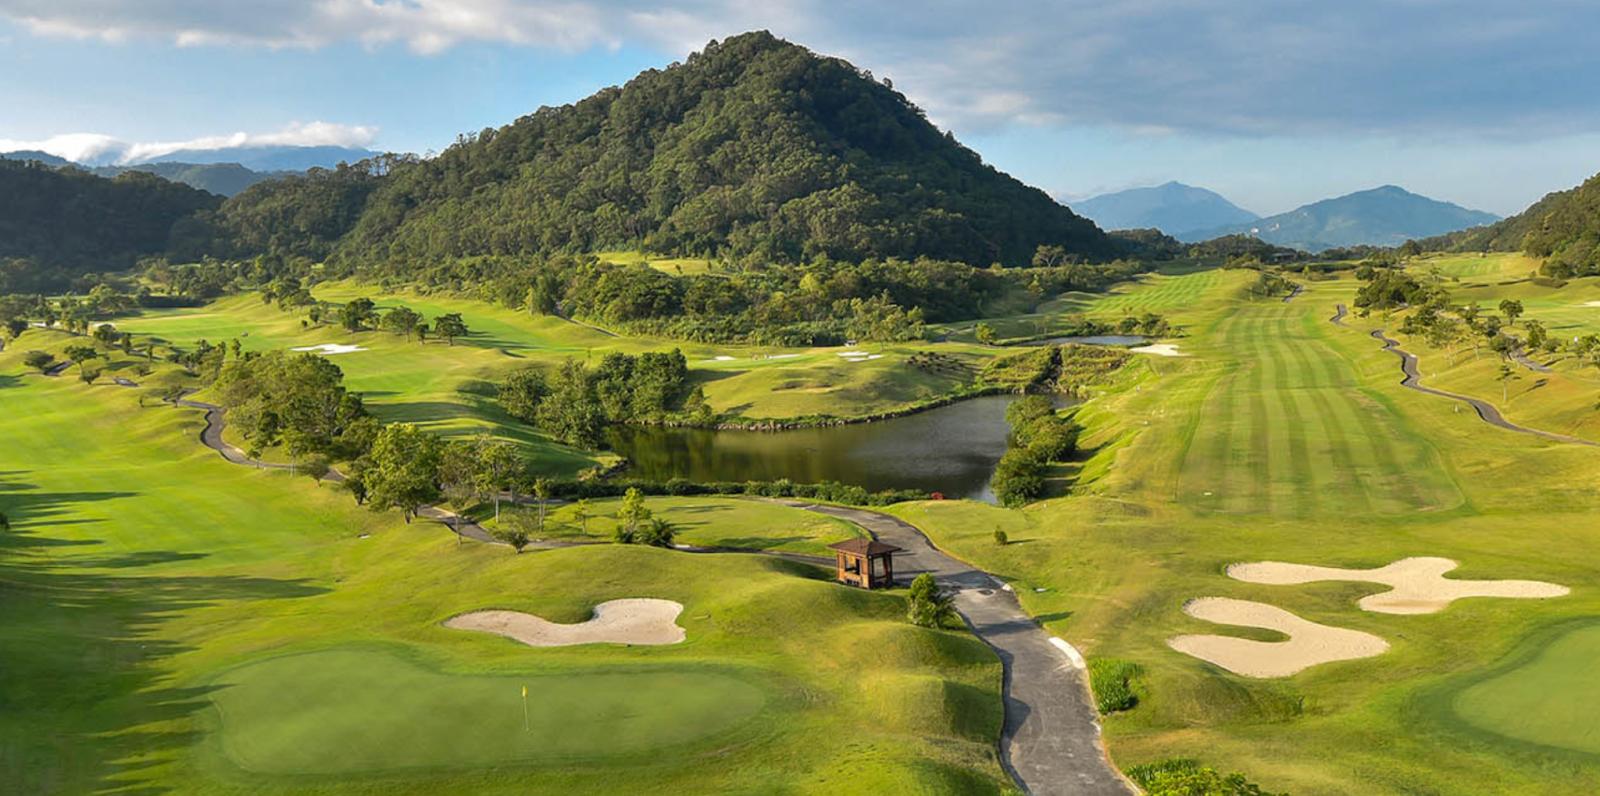 Sunshine Vally Golf Course